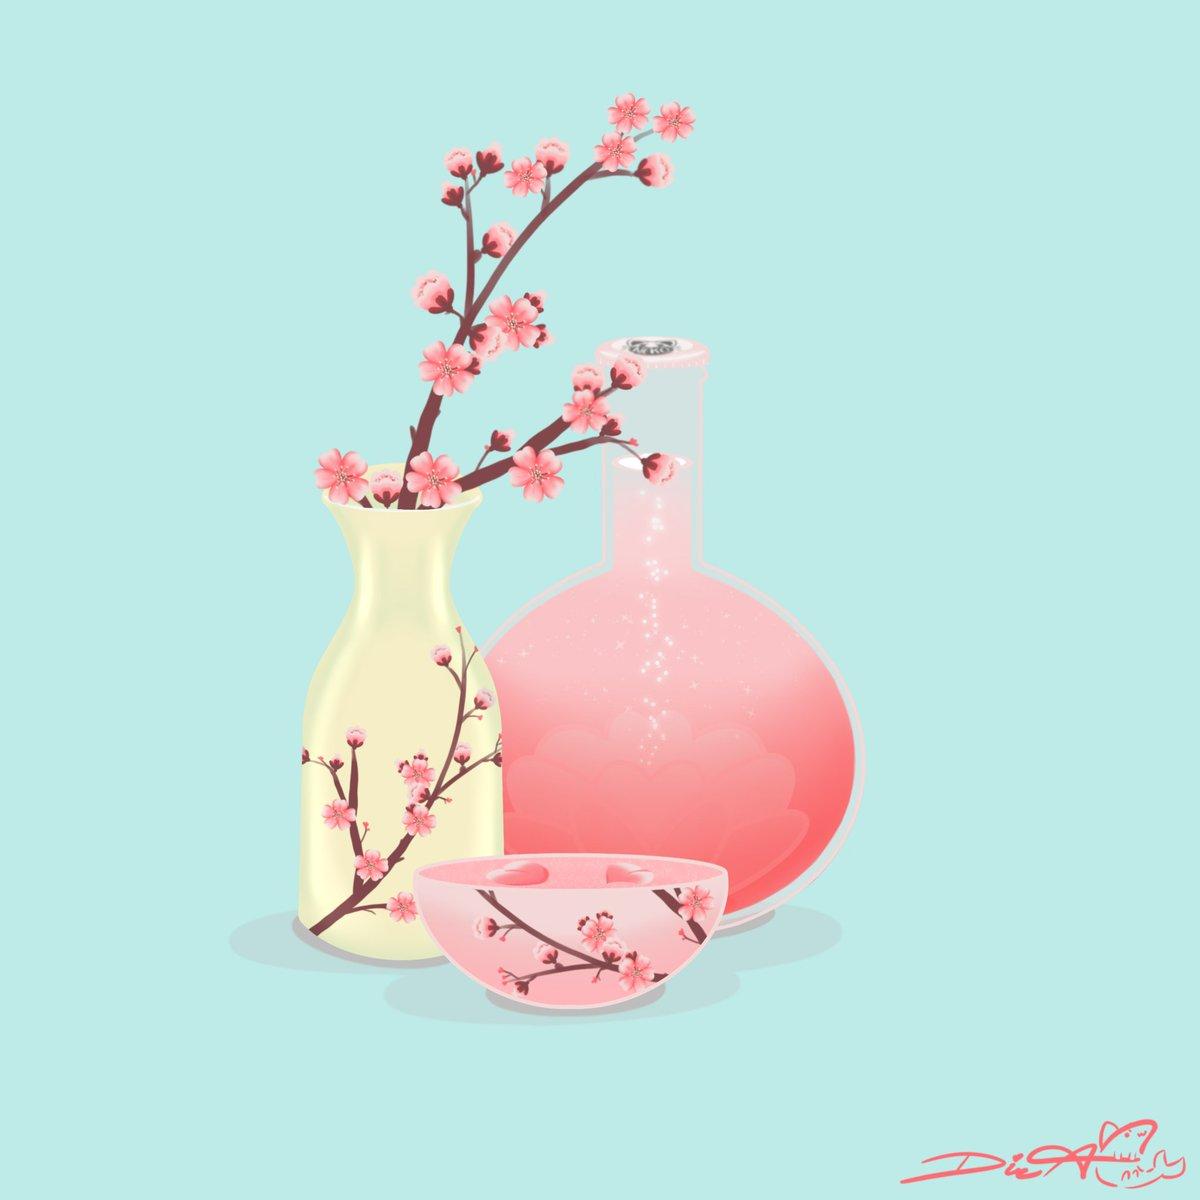 Cherry Blossom Sake ~  #Cherryblossom #sake #vectorartpic.twitter.com/5lcjLtVcUj